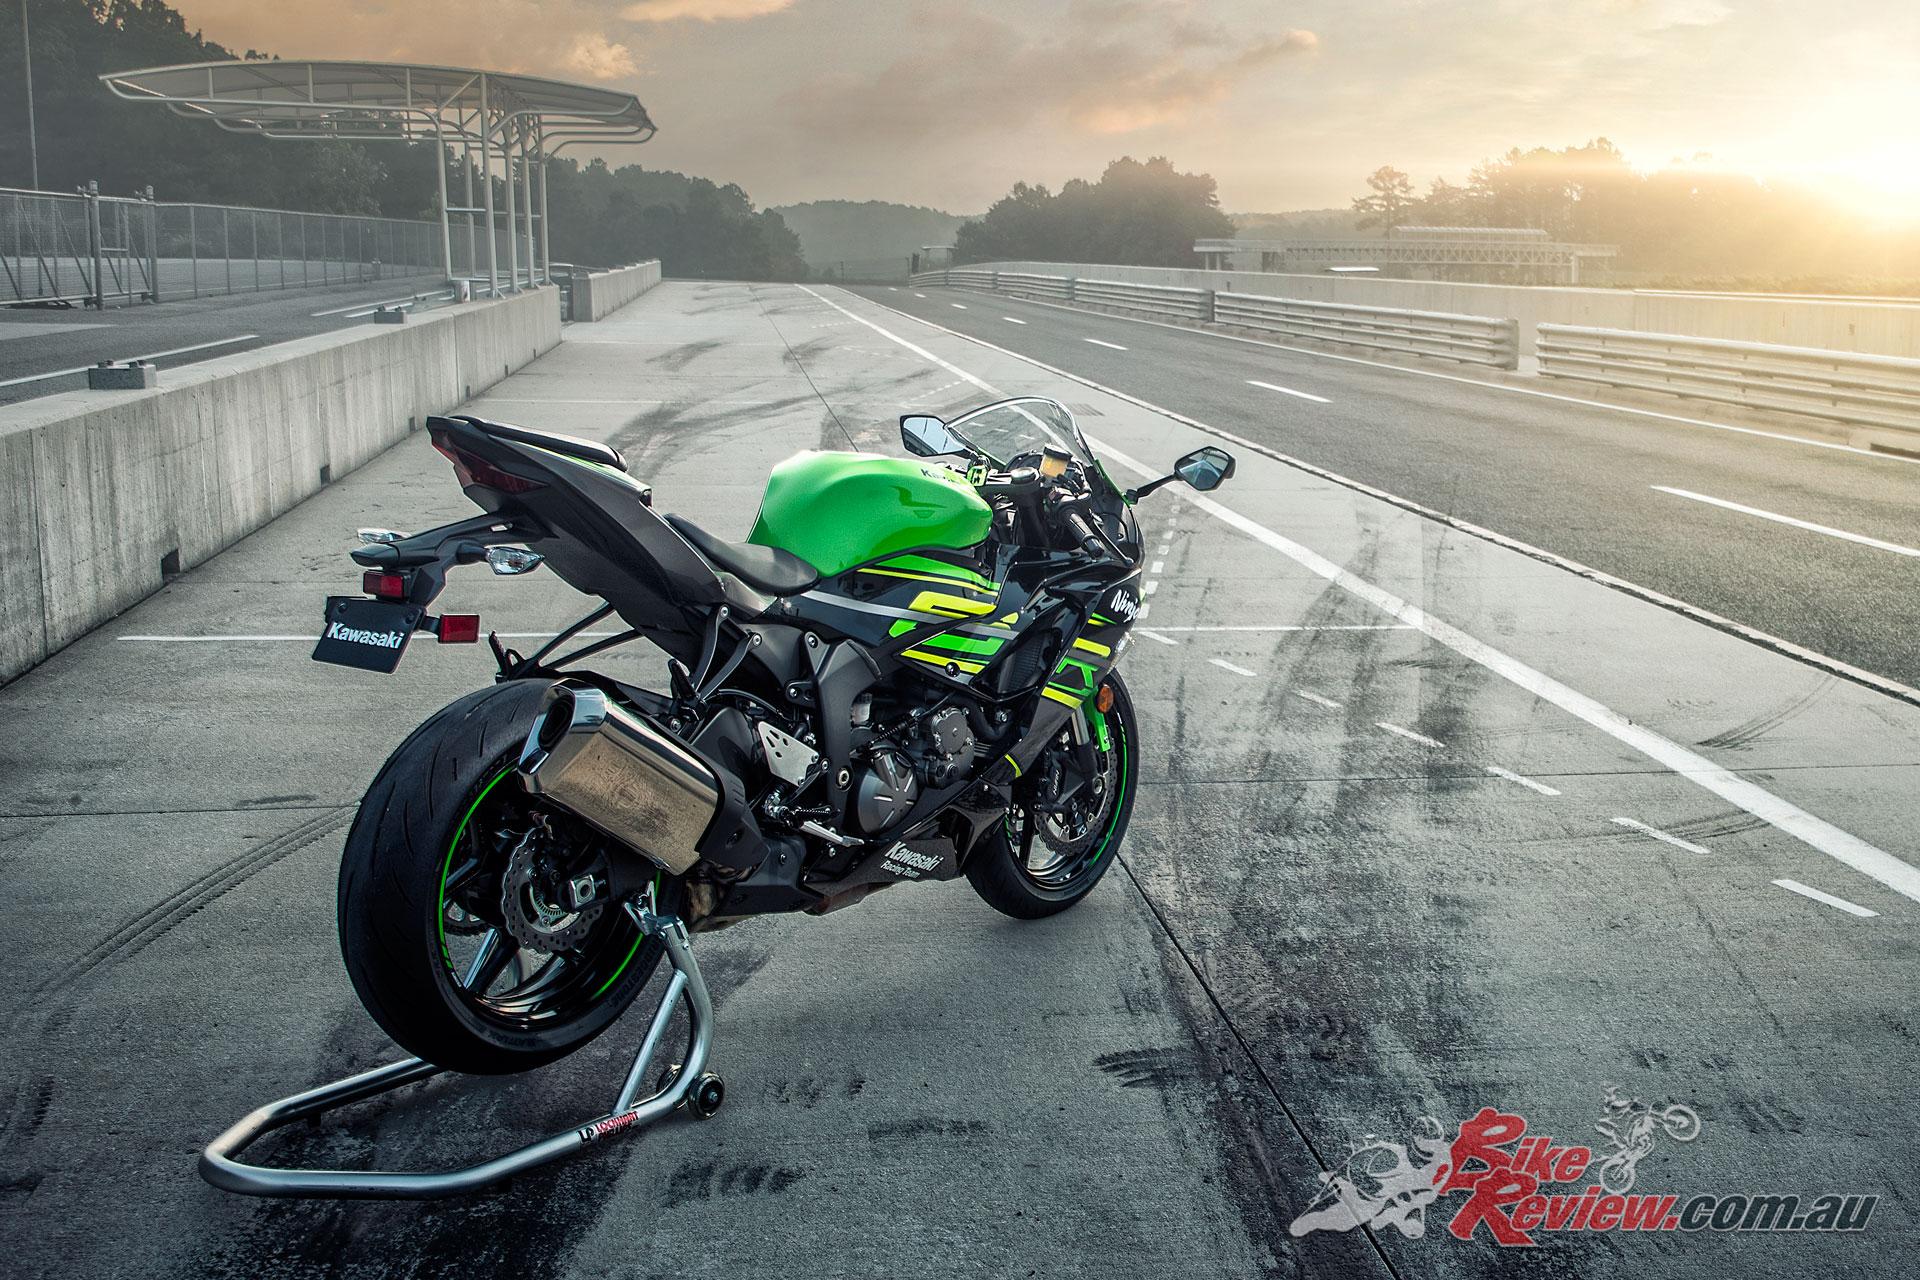 Model Update 2019 Kawasaki Ninja Zx 6r 636 Bike Review